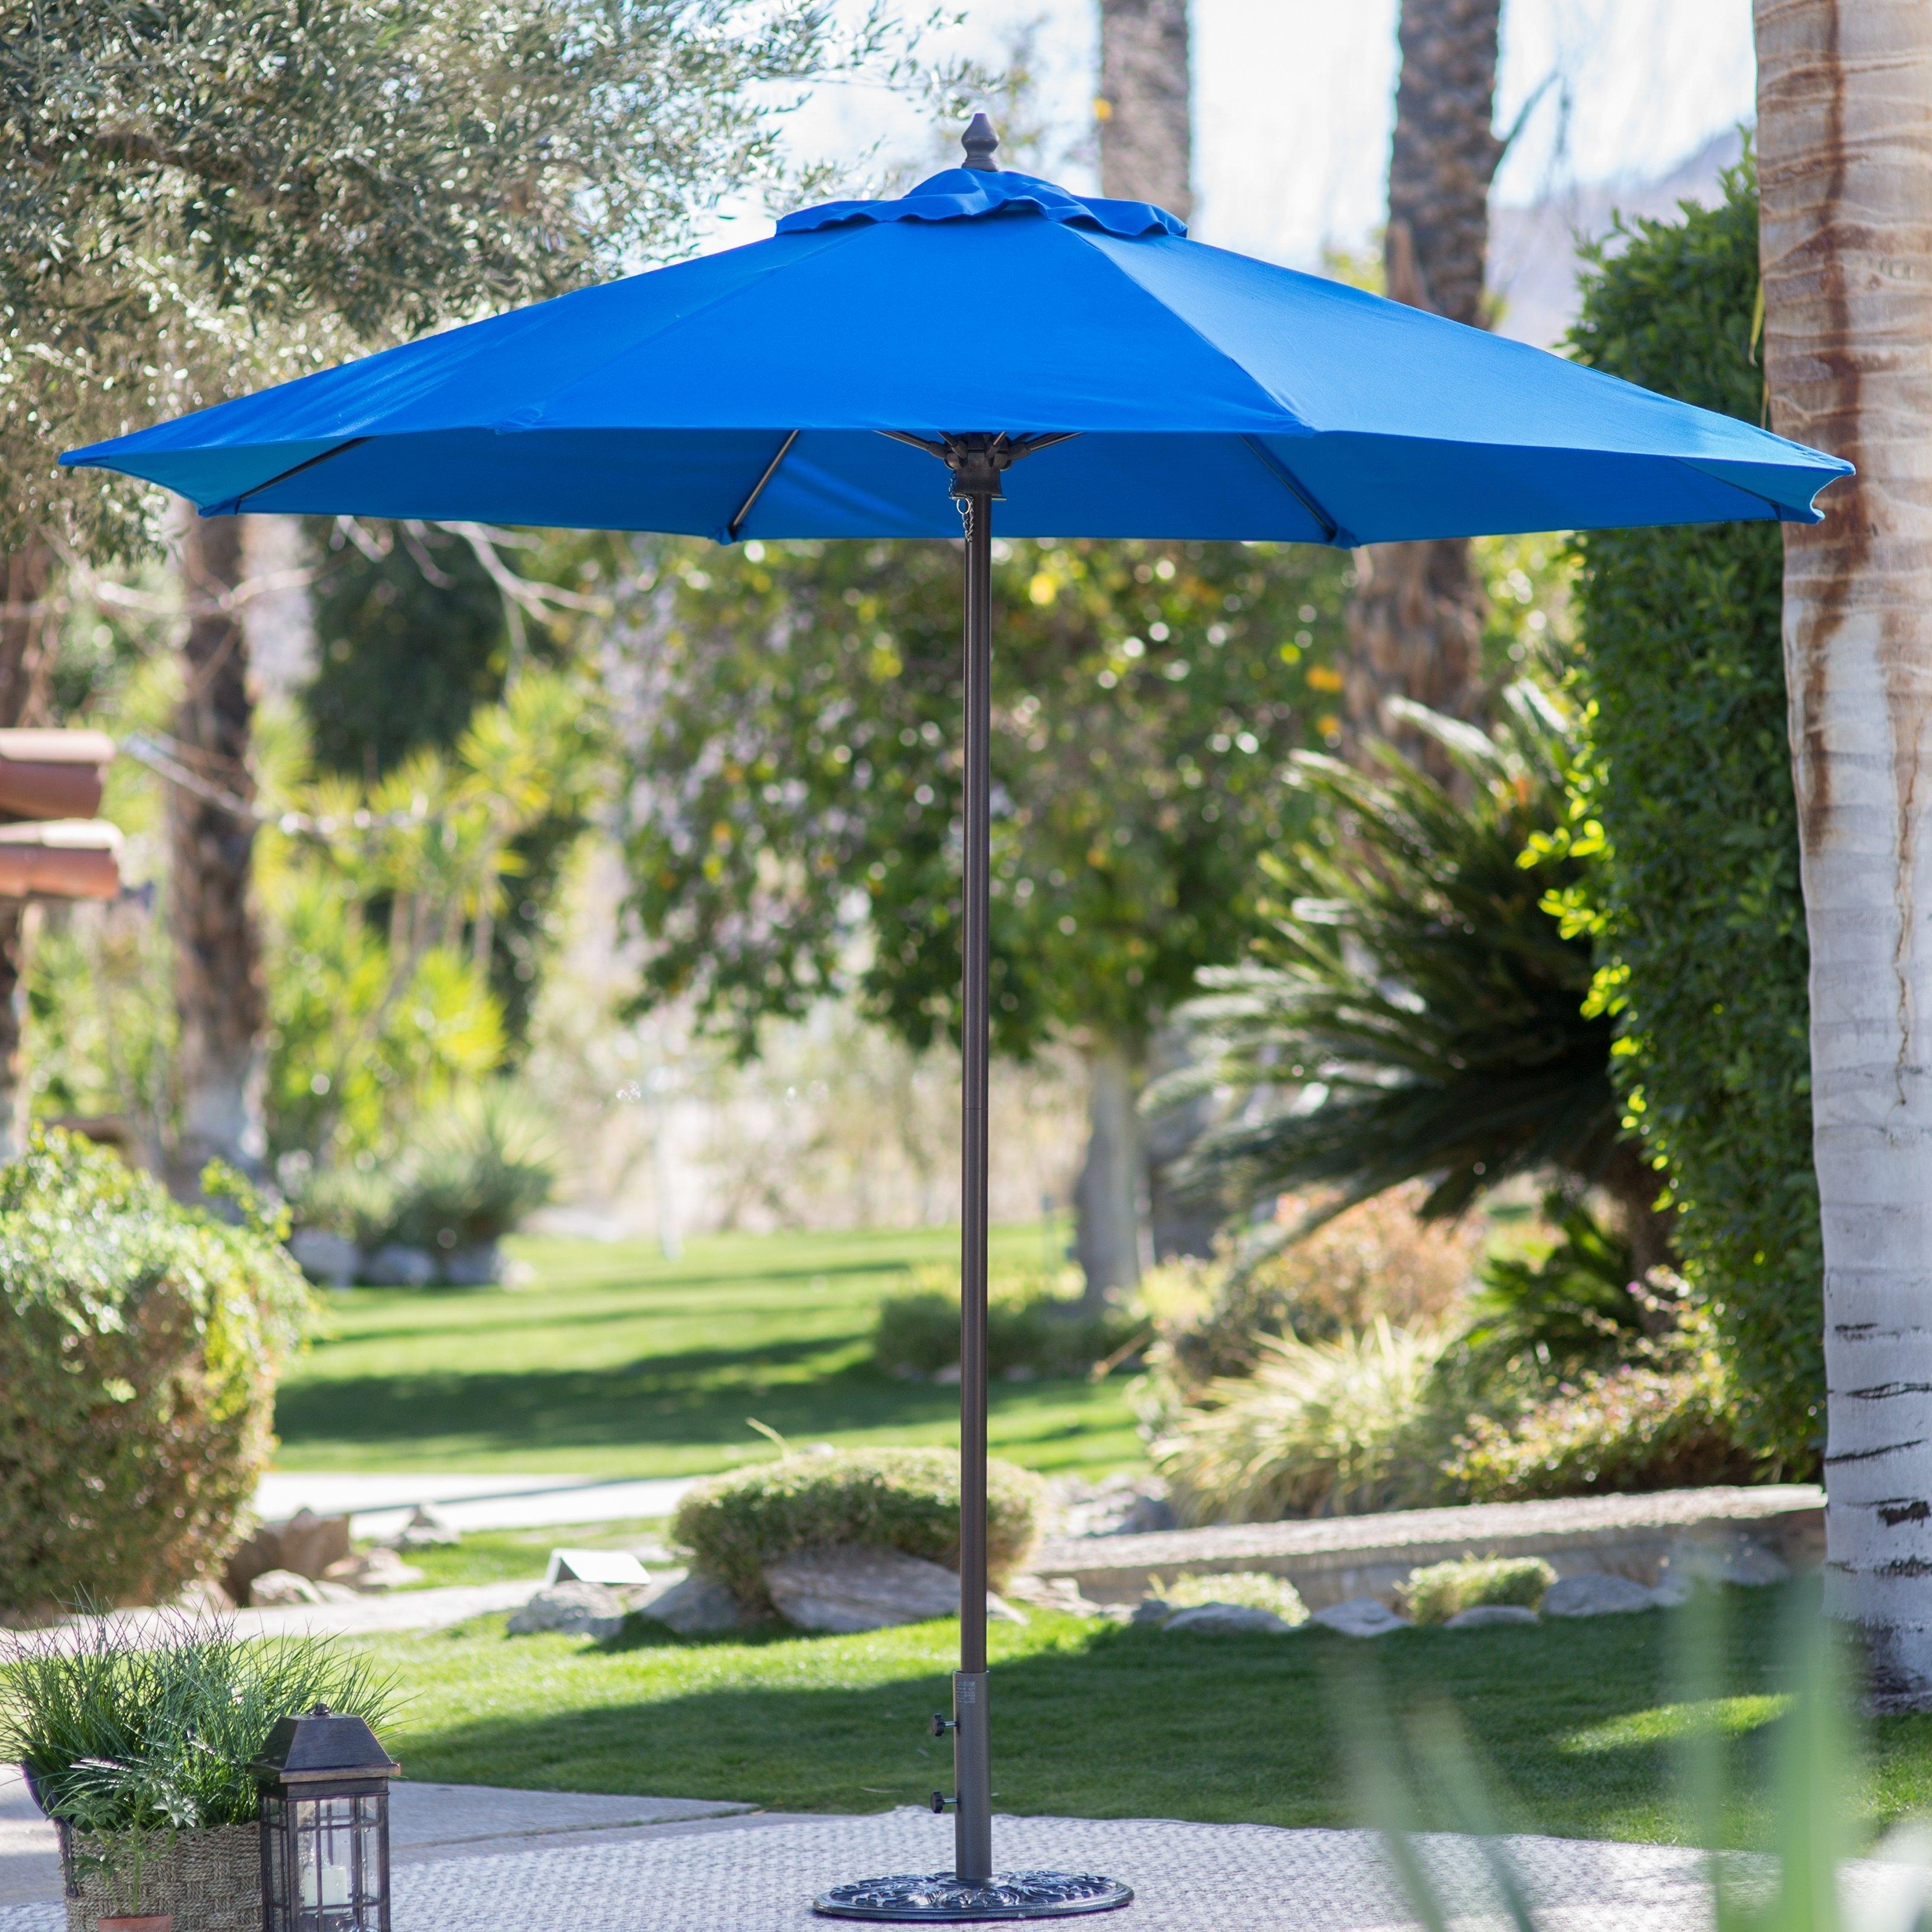 Commercial Patio Umbrellas Sunbrella Regarding Recent Coral Coast 9 Ft. Sunbrella Commercial Grade Aluminum Wind Resistant (Gallery 1 of 20)